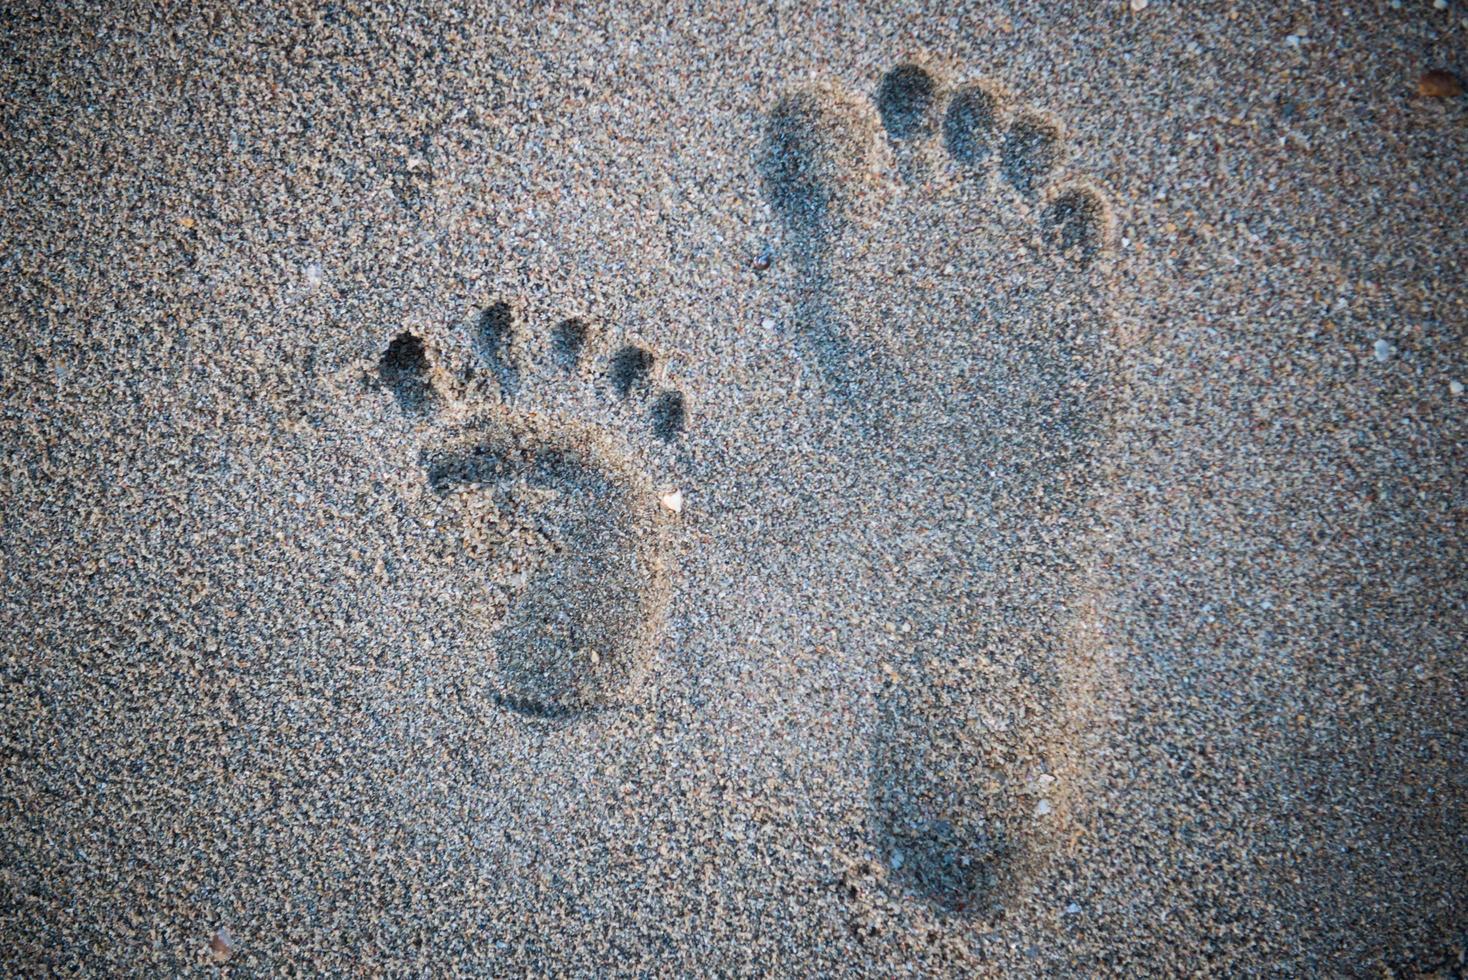 Cerrar foto de la huella humana derecha junto a la huella del niño en la playa de arena tropical